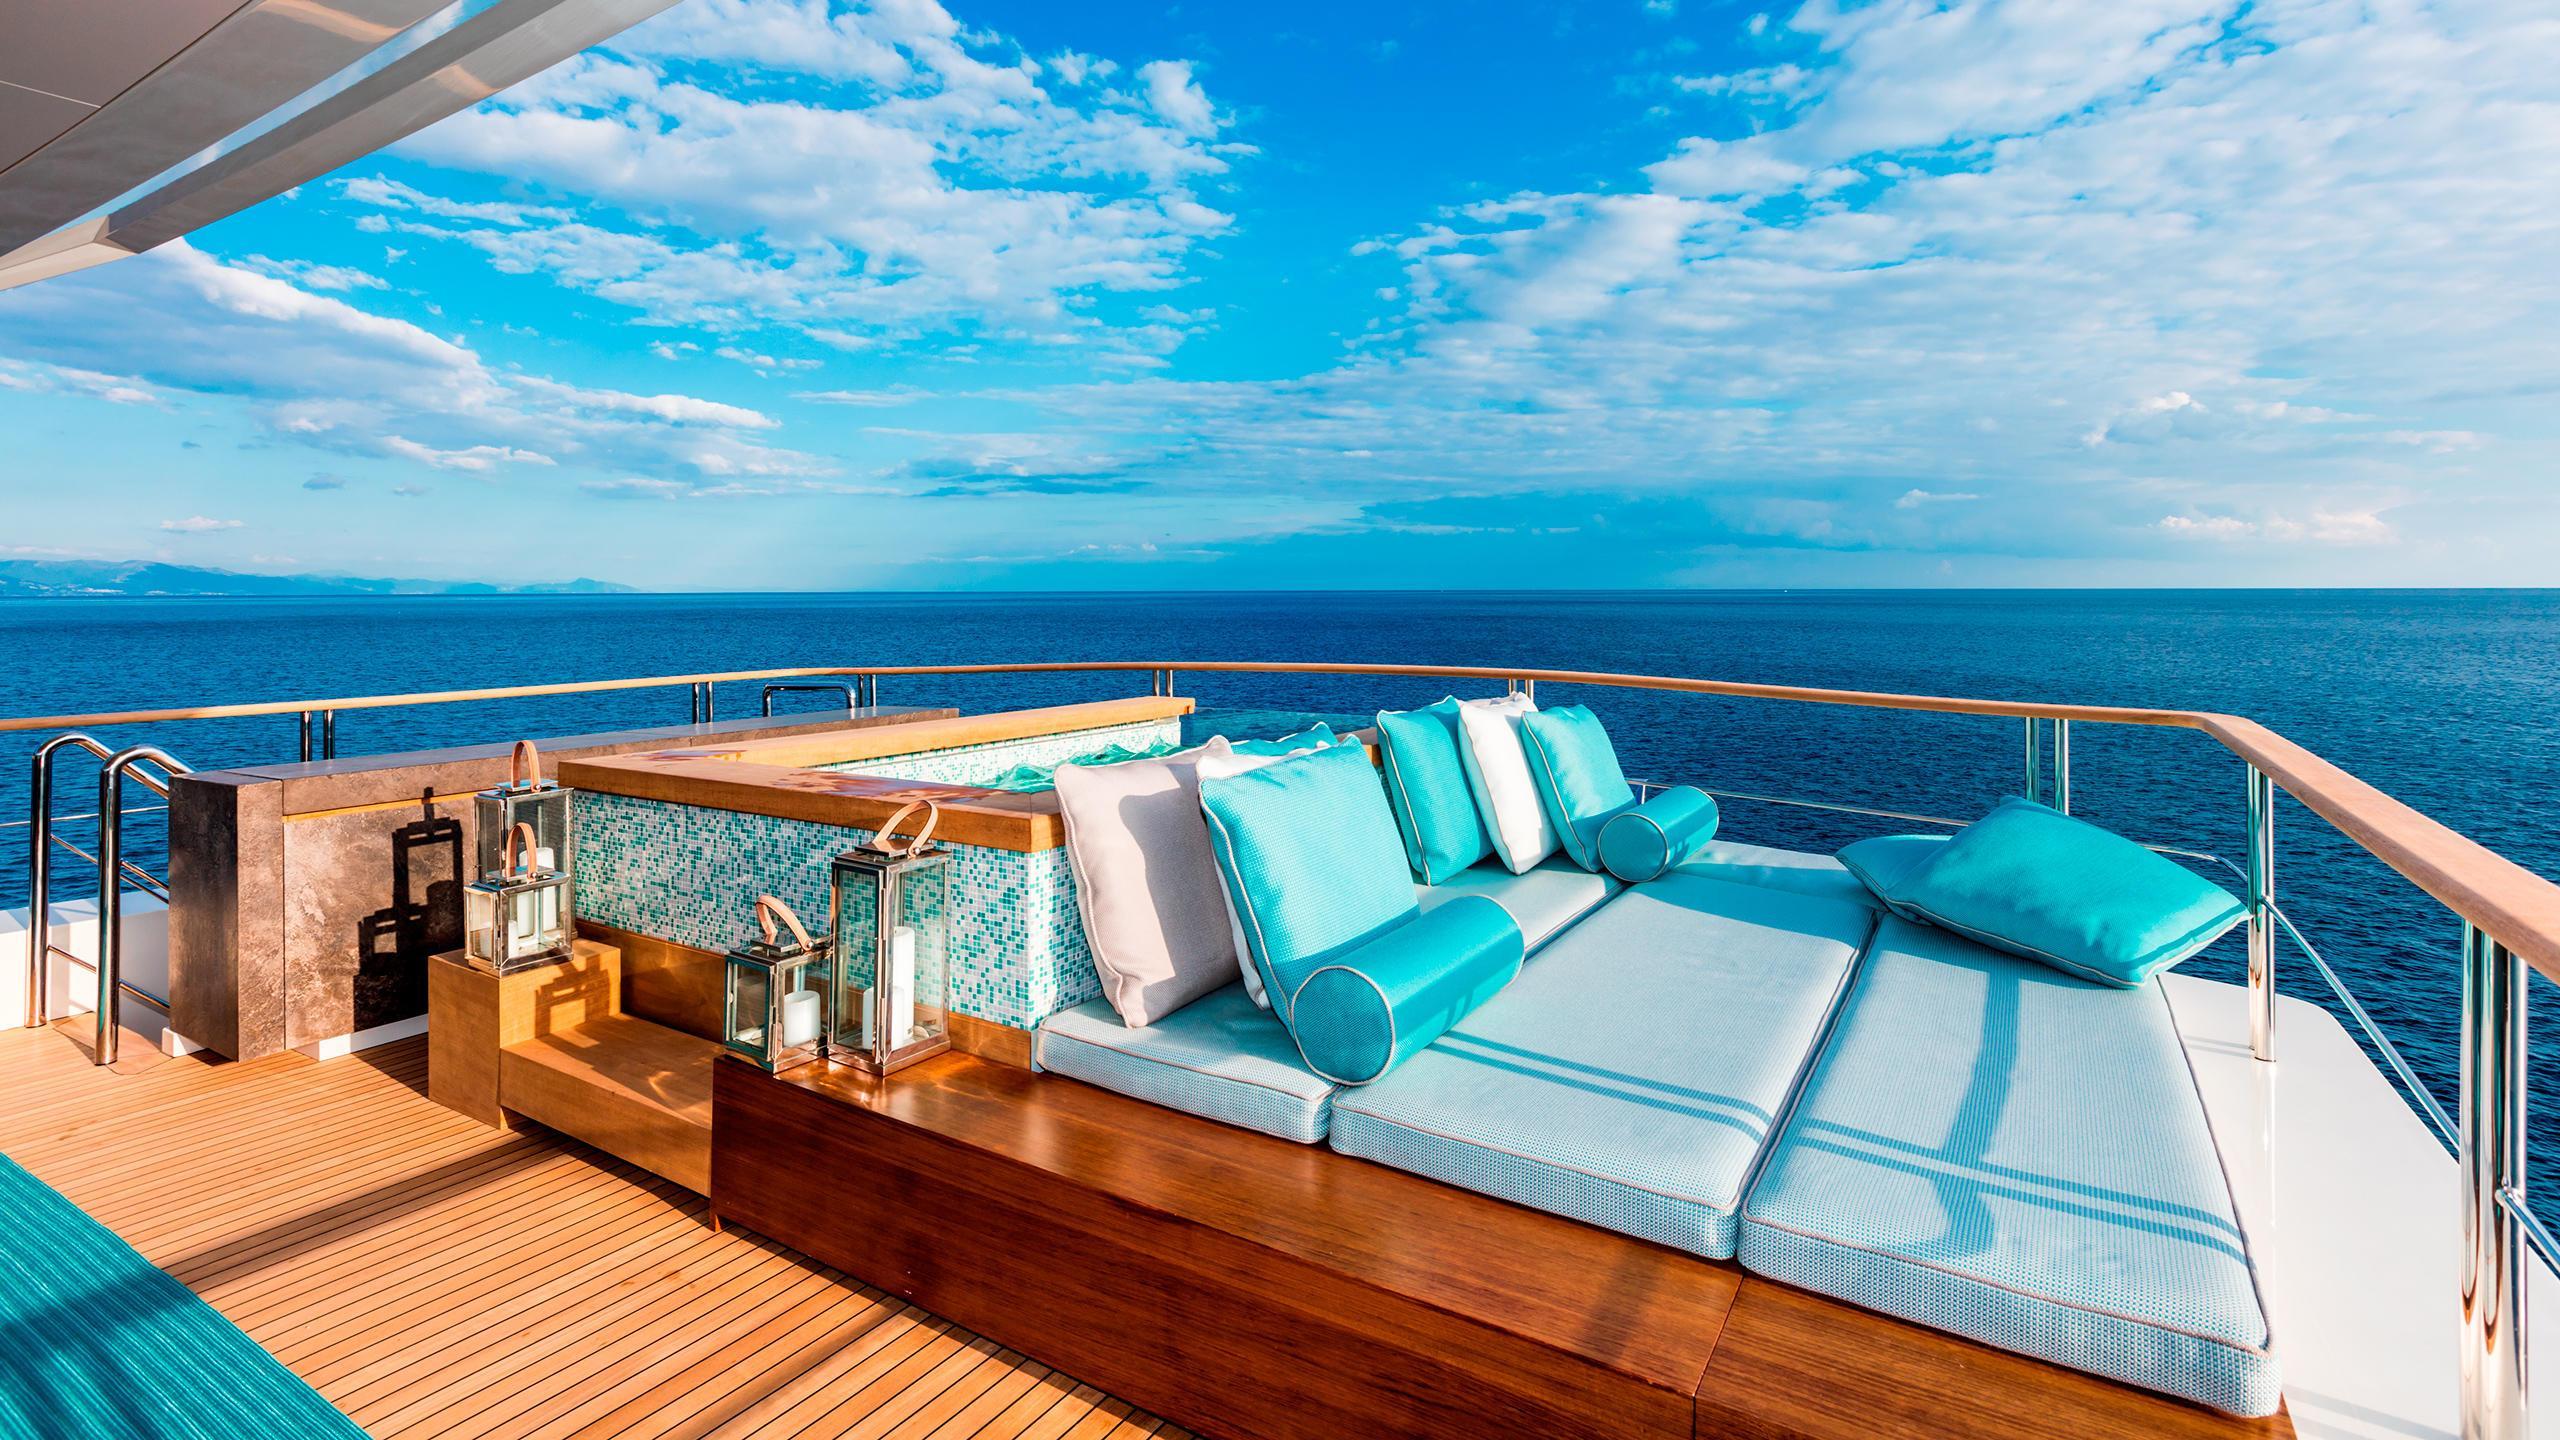 serenity-motor-yacht-mondomarine-2015-42m-sun-deck